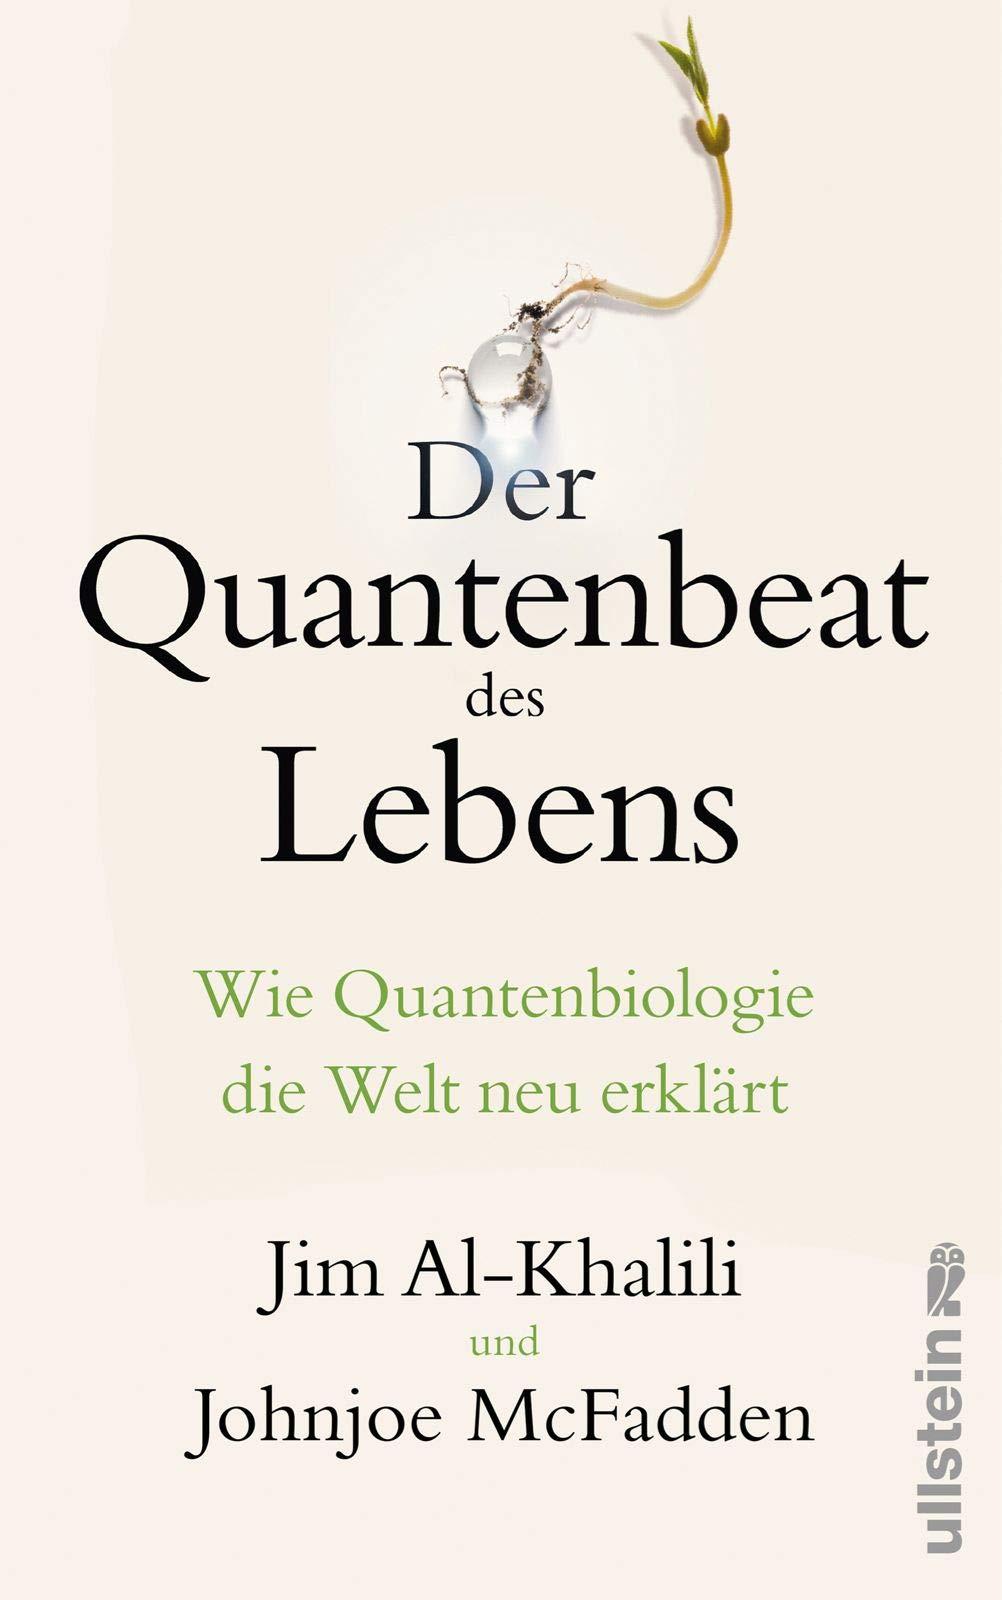 Der Quantenbeat Des Lebens  Wie Quantenbiologie Die Welt Neu Erklärt